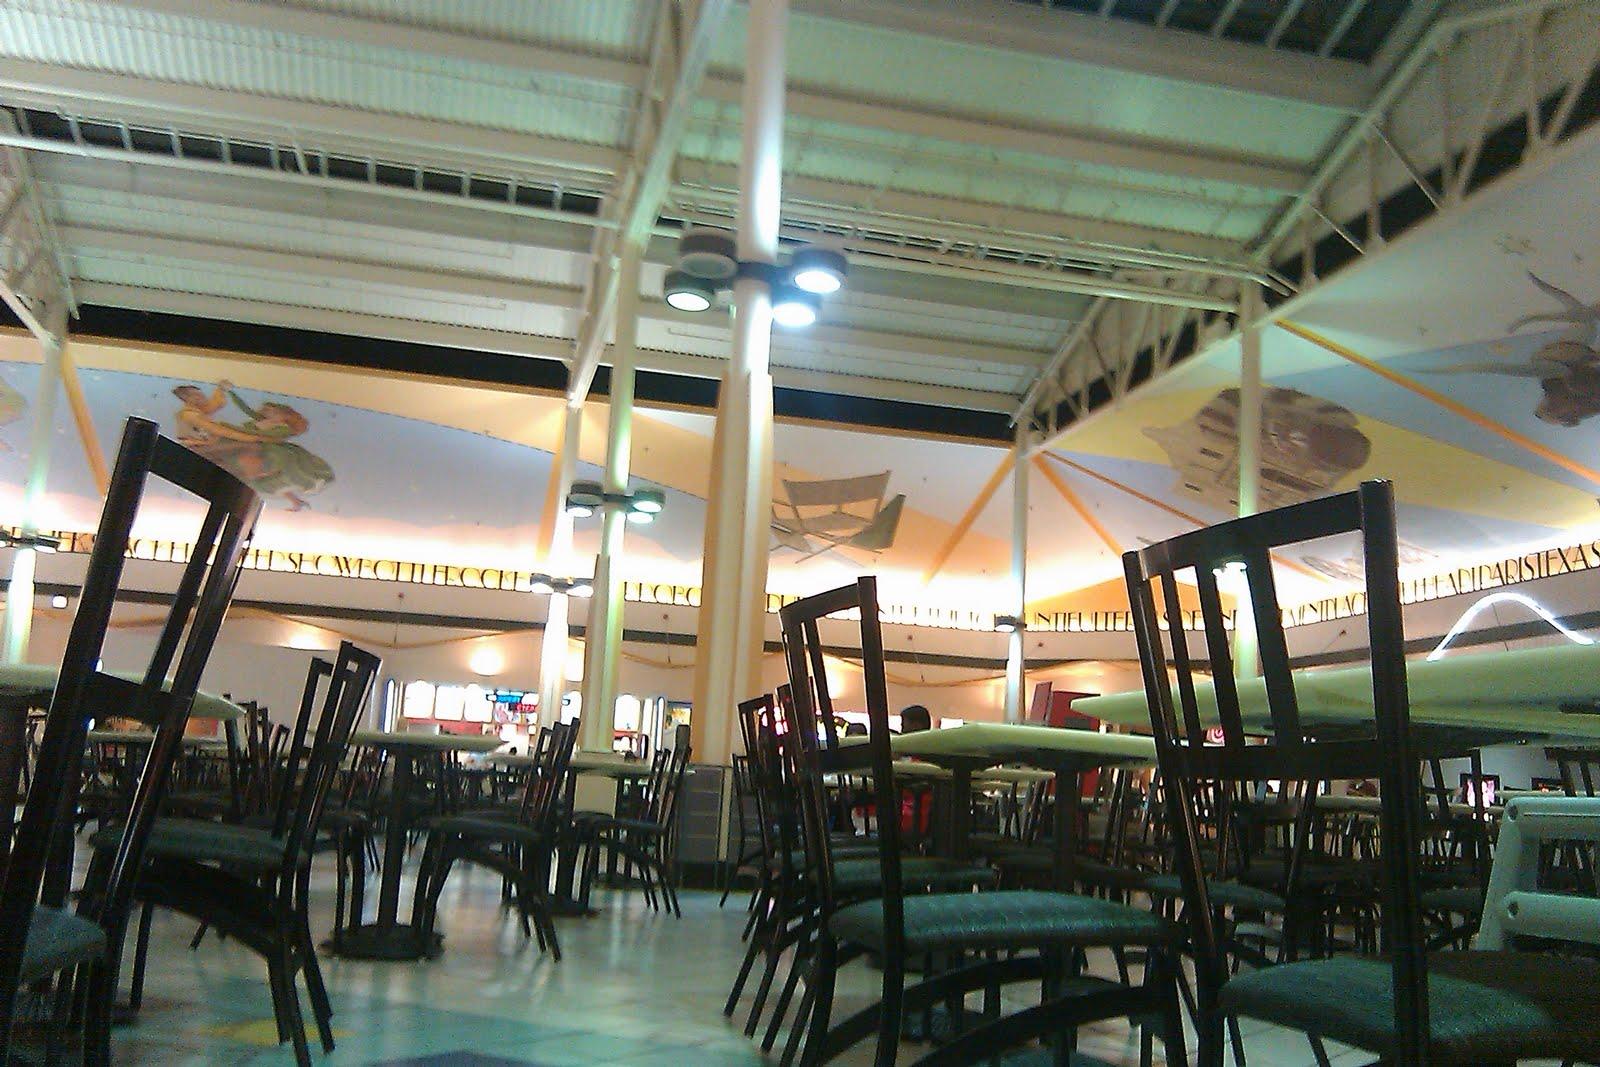 Central Mall Texarkana Food Court